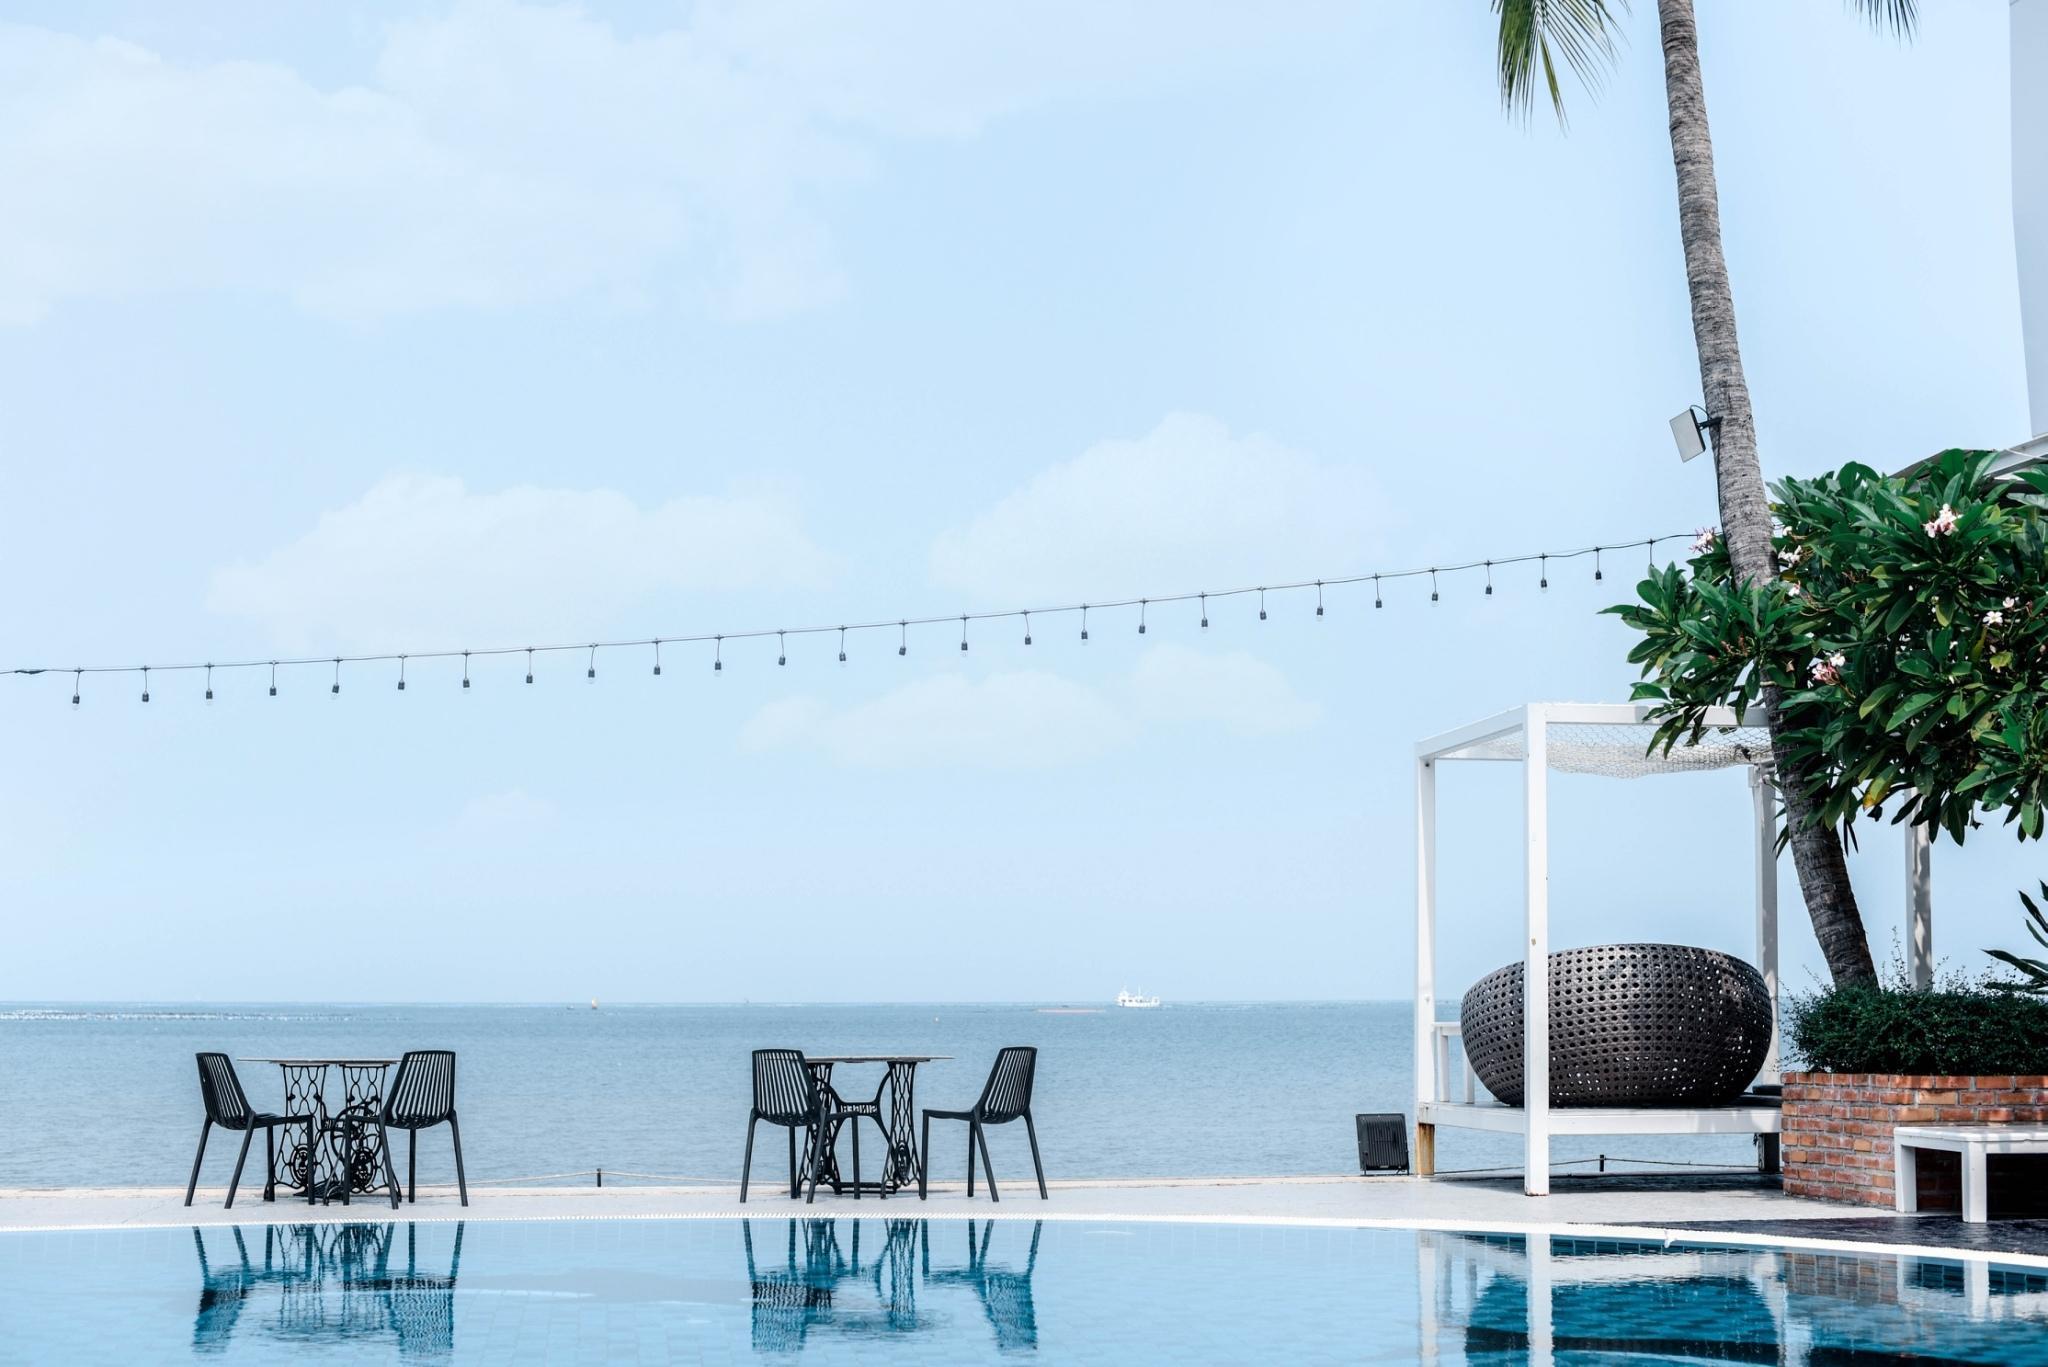 The Loft Seaside Sriracha Hotel โรงแรมเดอะ ลอฟต์ ซีไซด์ ศรีราชา